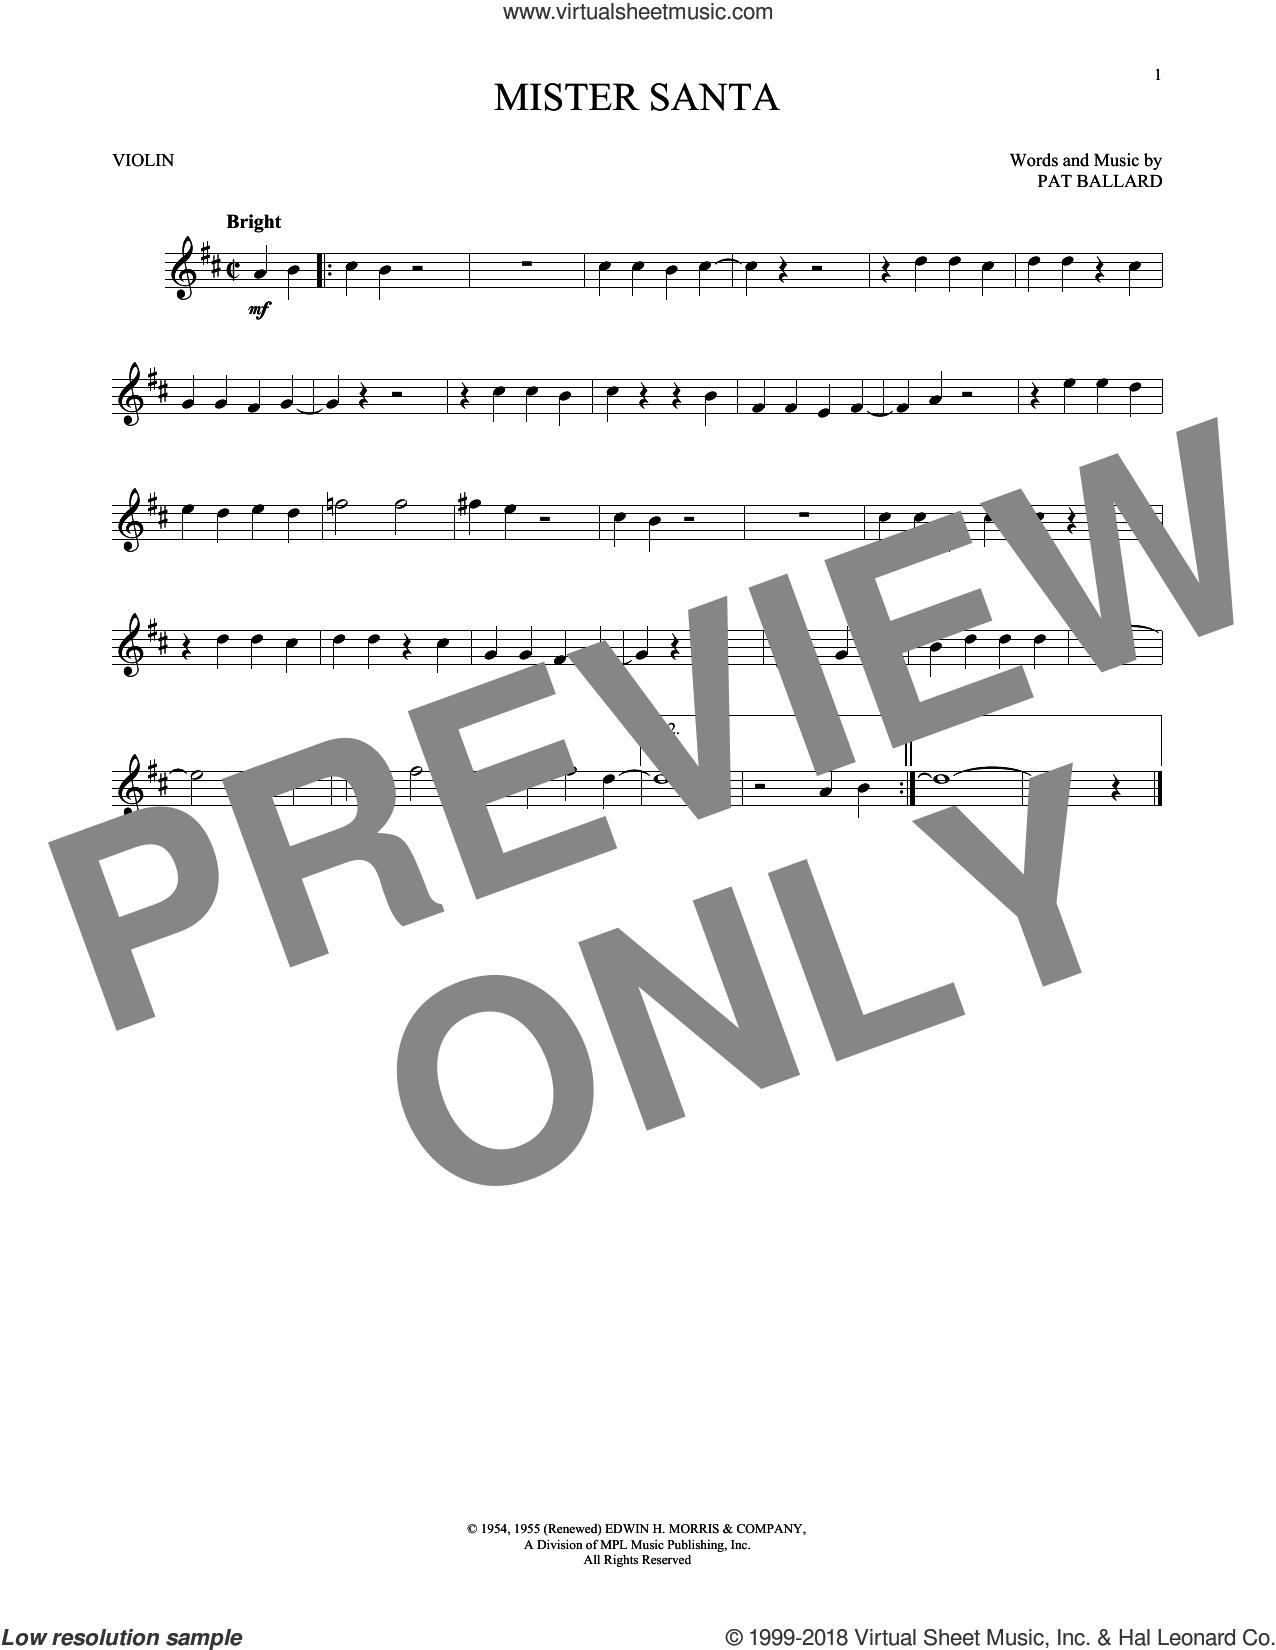 Mister Santa sheet music for violin solo by Amy Grant and Pat Ballard, intermediate skill level